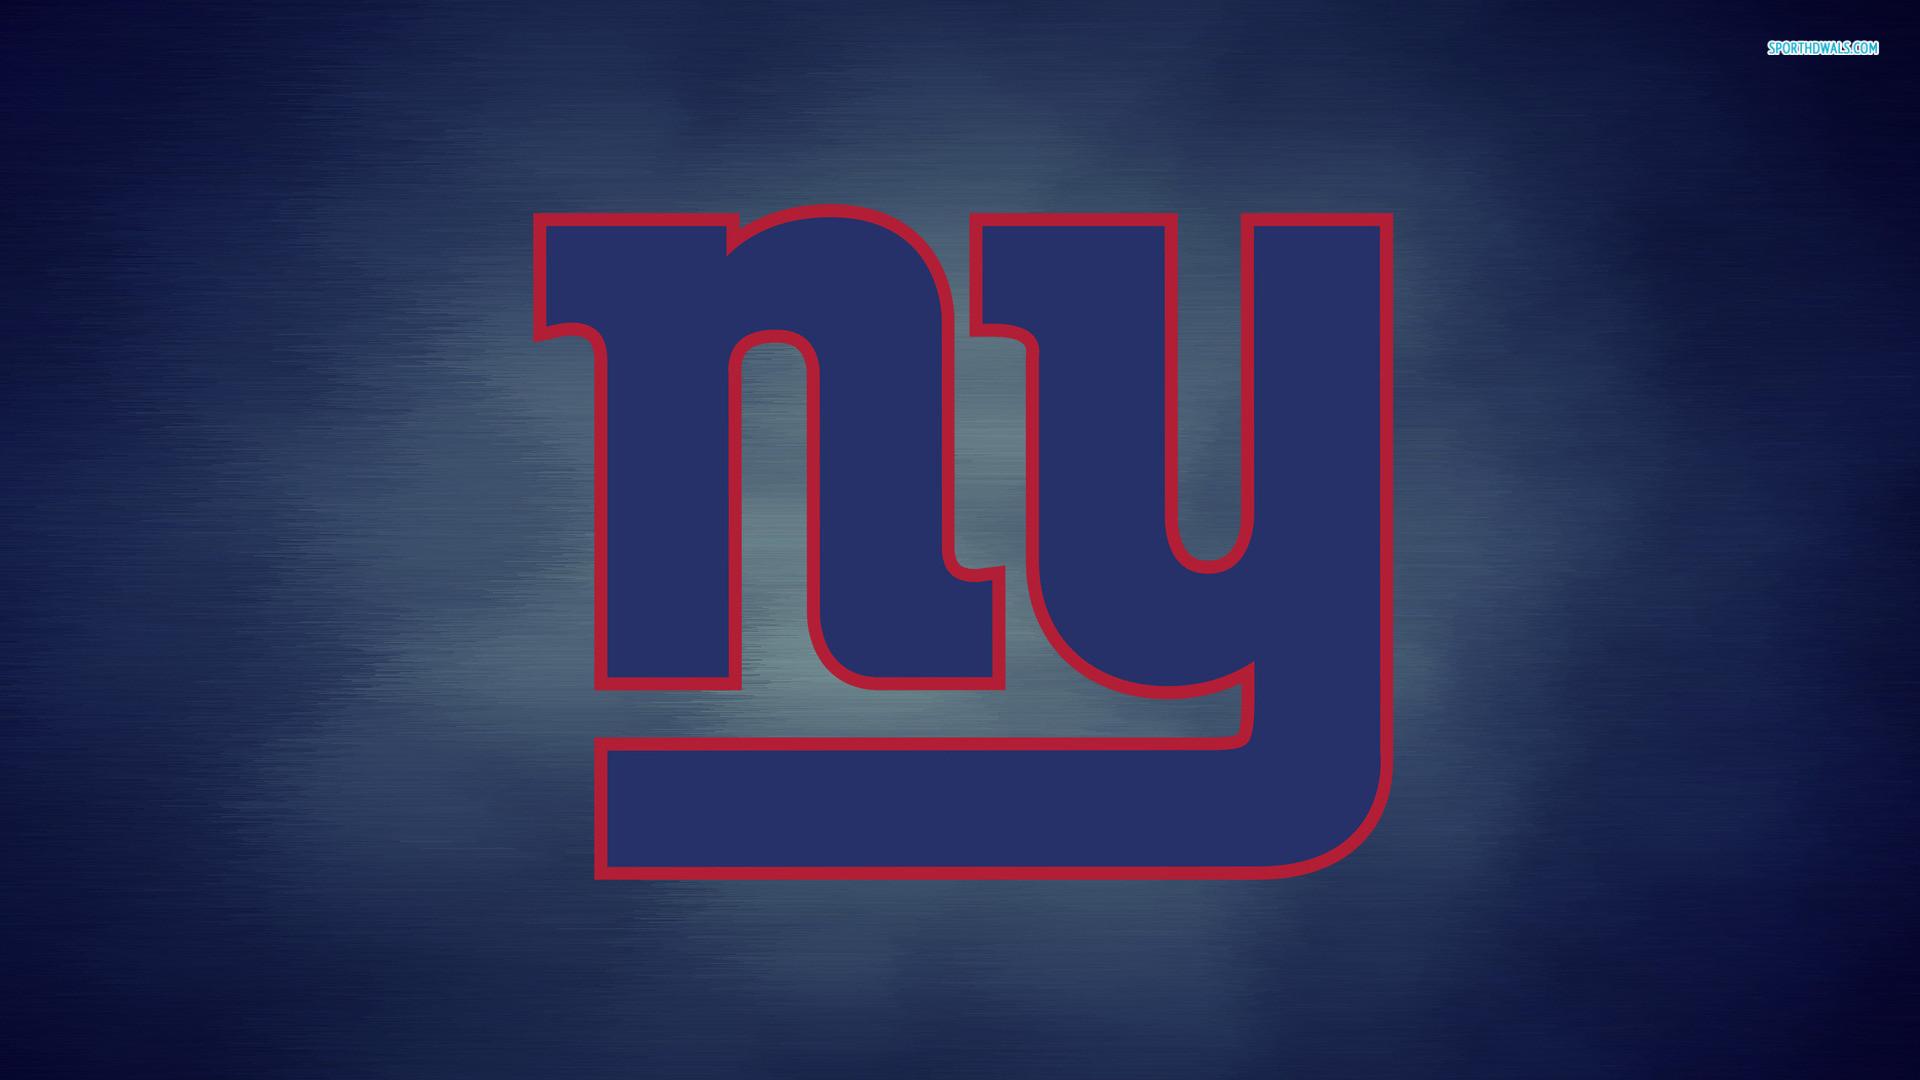 New York Giants Football Team Logo